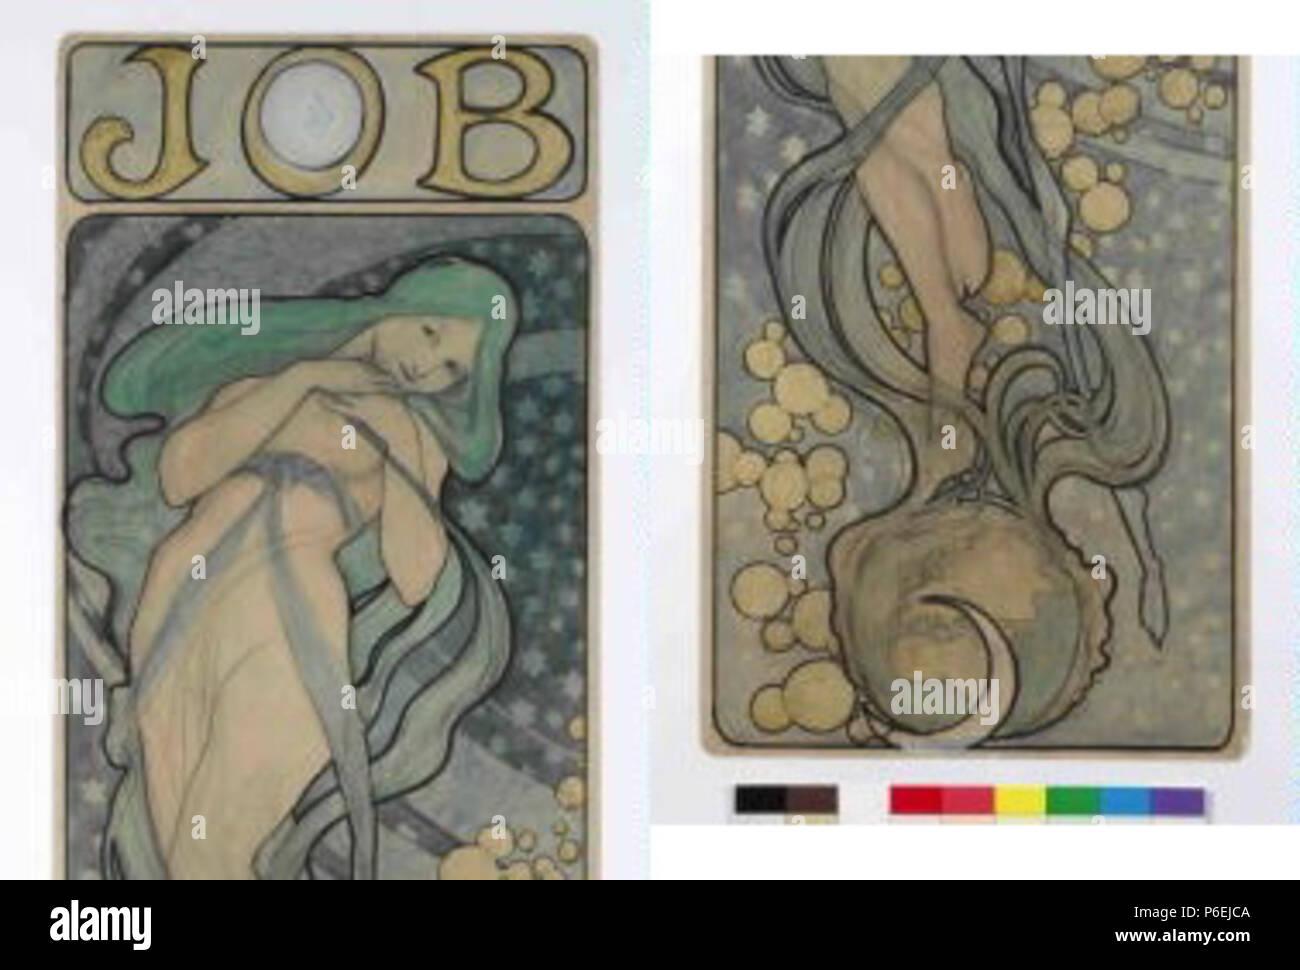 . Eština Návrh plakát: na travail circa 1897 6 auteurs Alfons Mucha 24.7.1860-14.7,1939 - Navrh na plakat JOB Banque D'Images